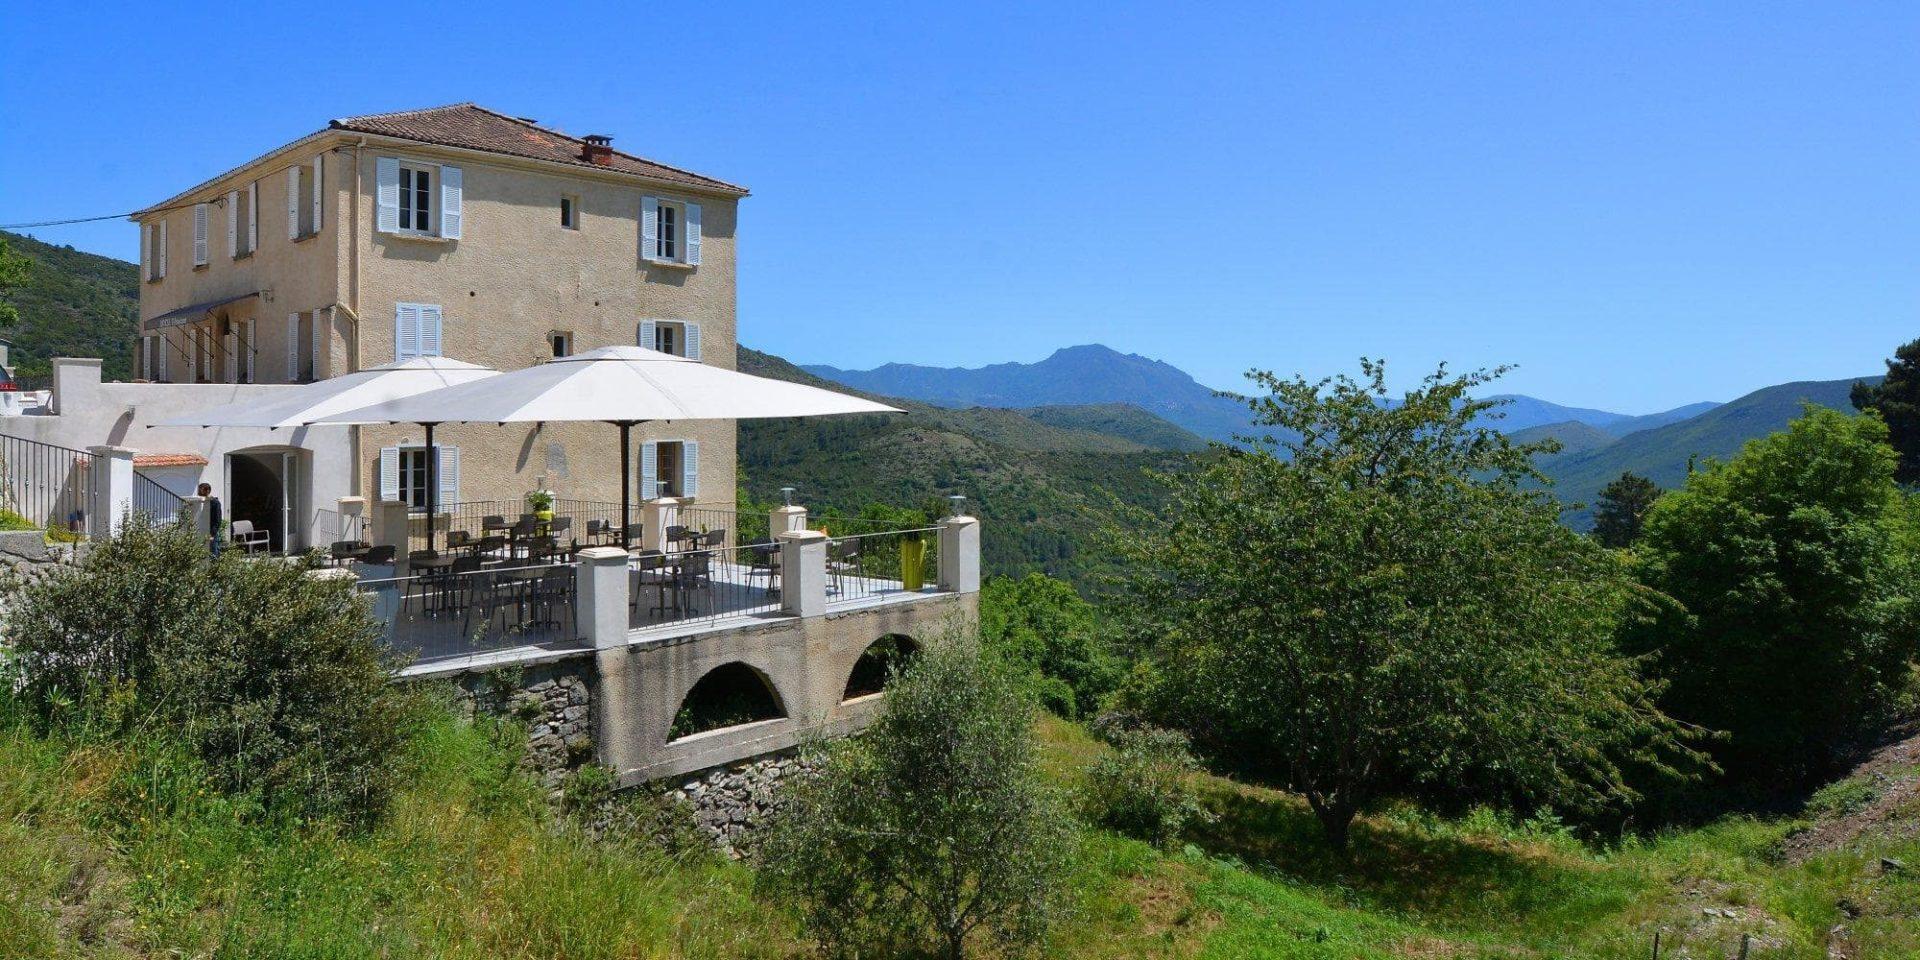 Hotel U Frascone Venaco Restonica Corsica Frankrijk façade terras uitzicht Vecchio vallei